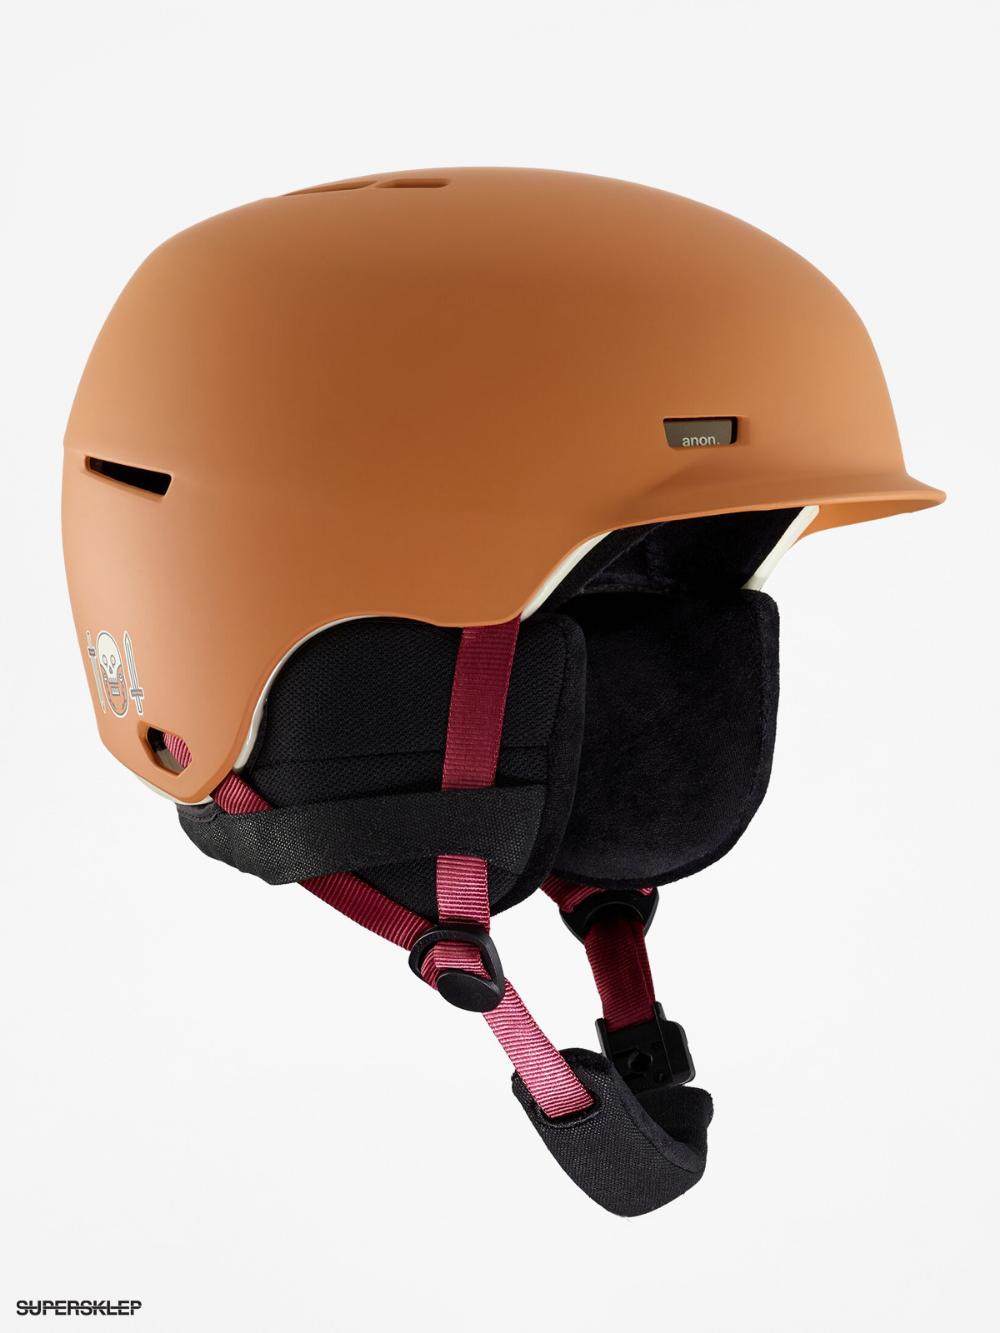 Kask Anon Highwire Doa Orange In 2020 Helmet Doa Bicycle Helmet